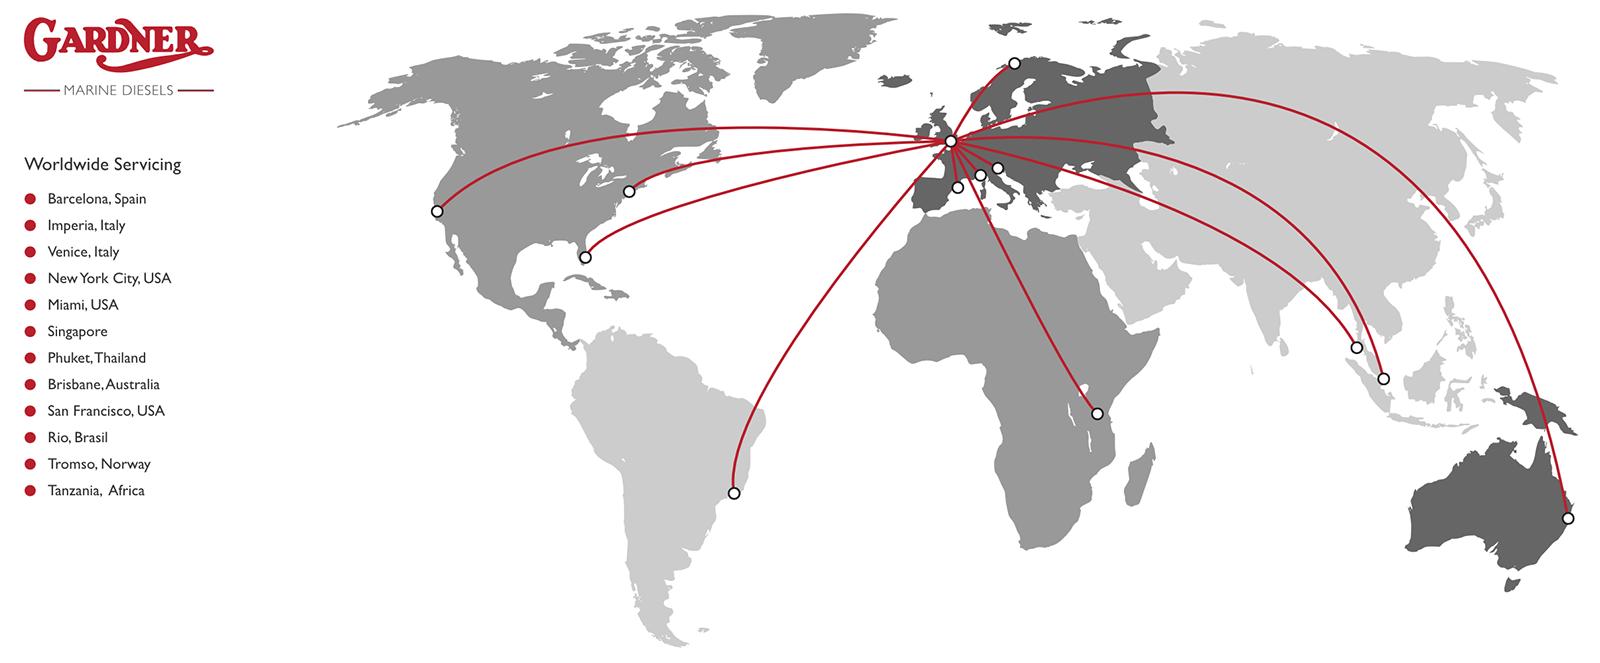 Gardner Marines Diesels - Worldwide On-Site Servicing Map Locations